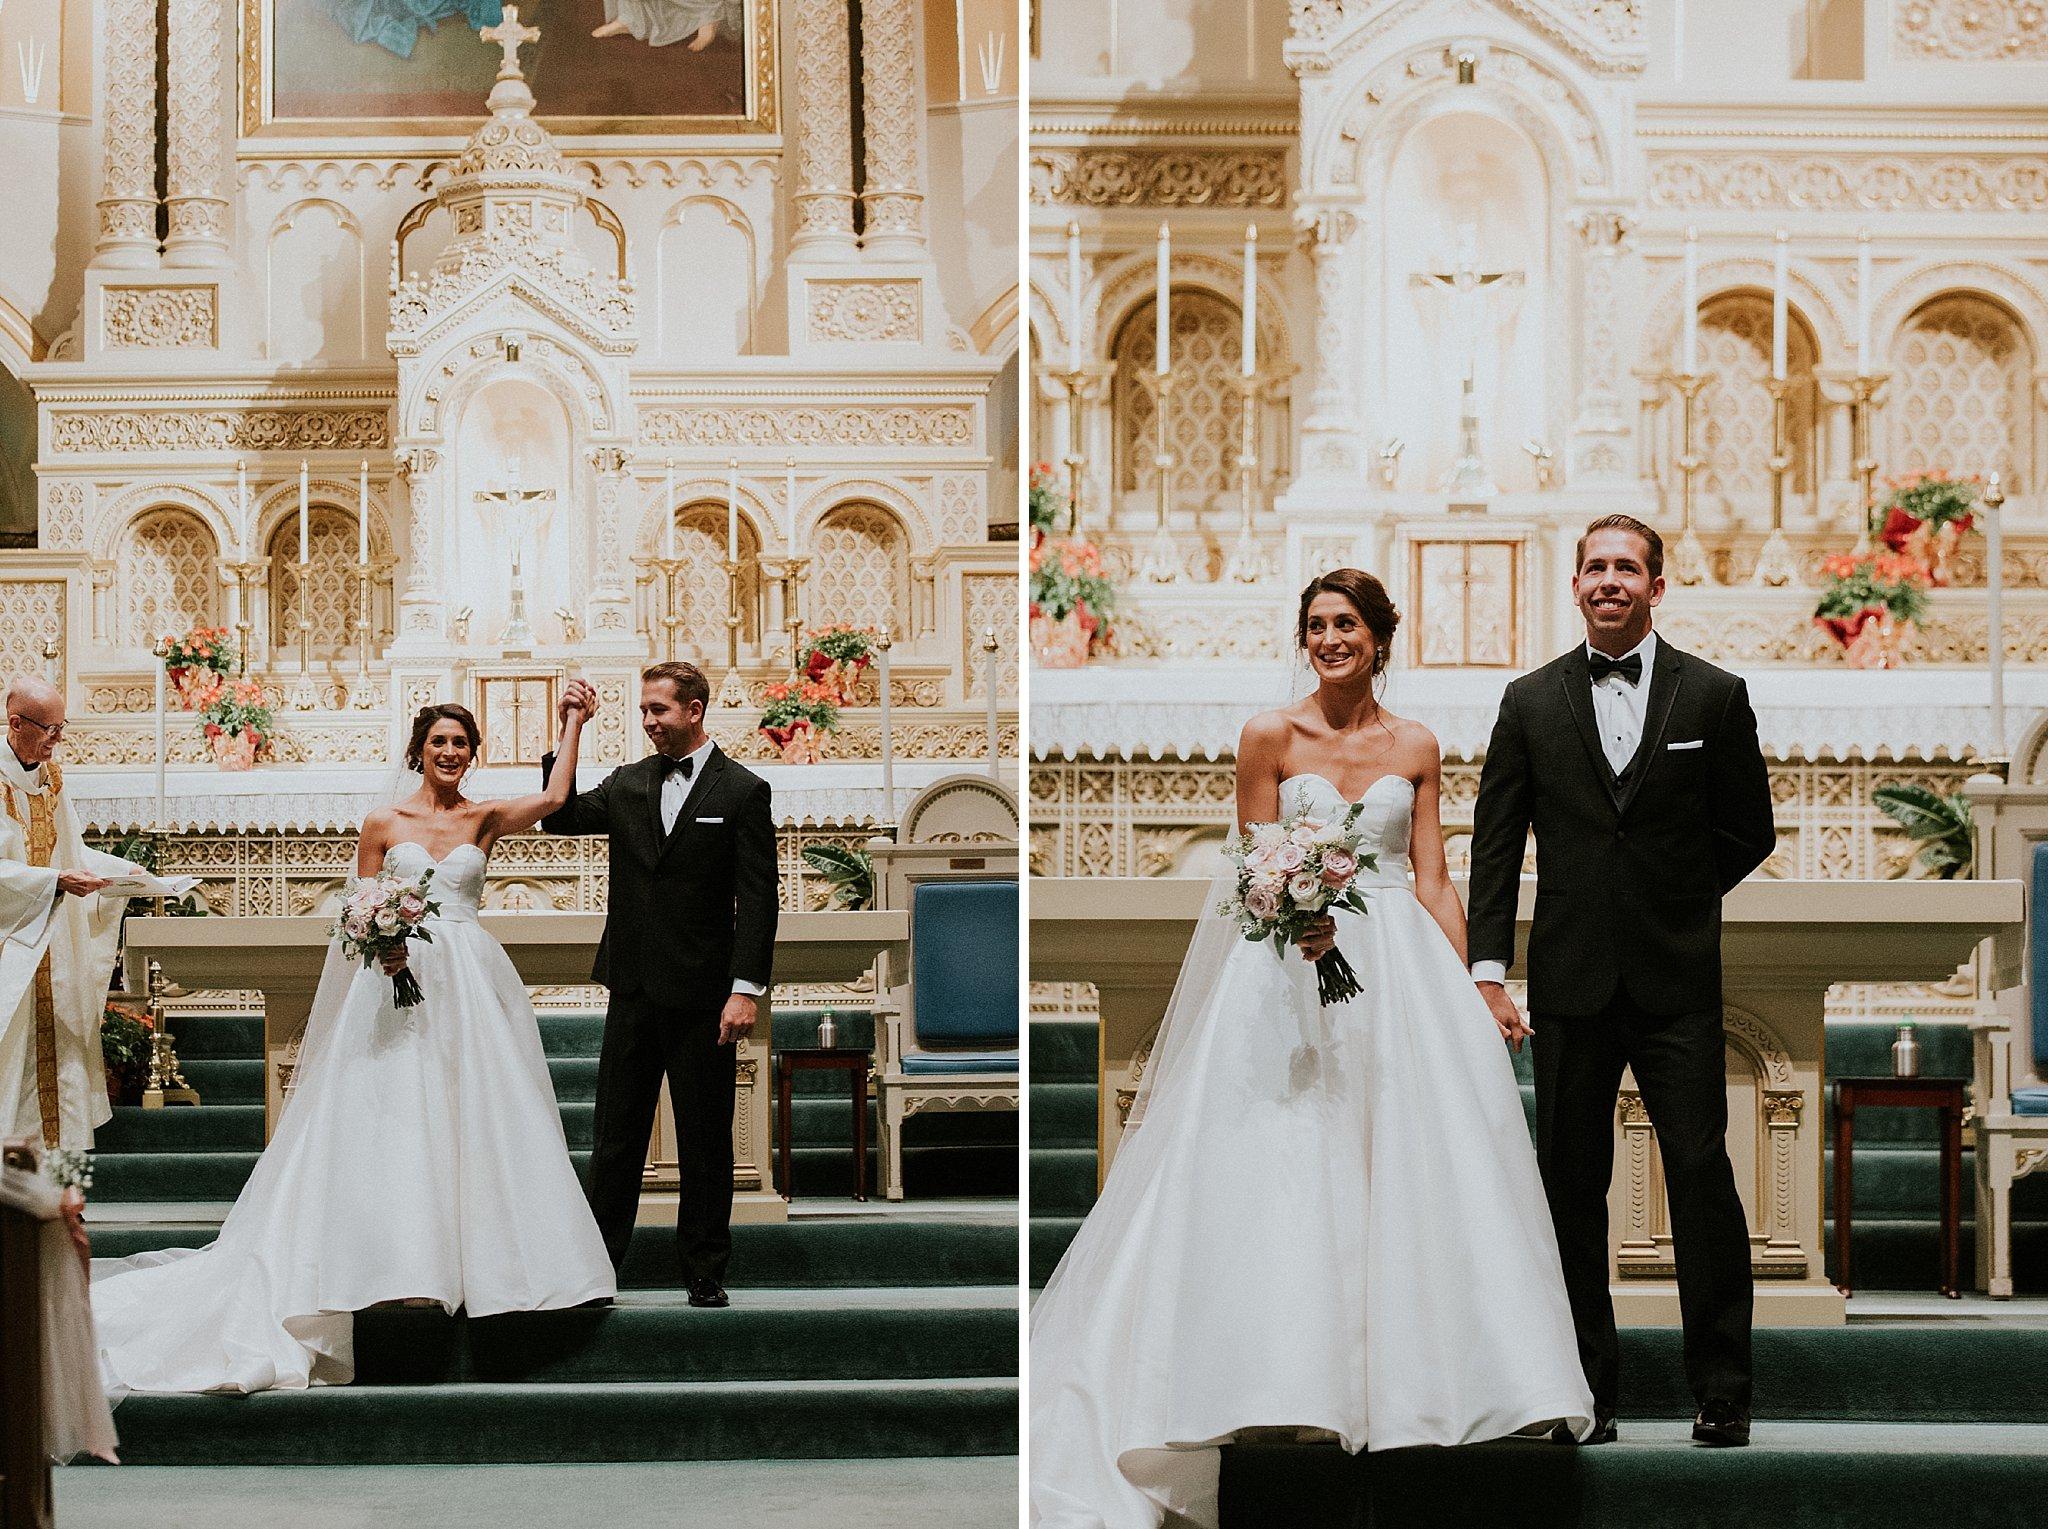 Matt-Lauren_St-Marys_Hilton-City-Center-Milwaukee-Wedding_liller-photo_0026.jpg